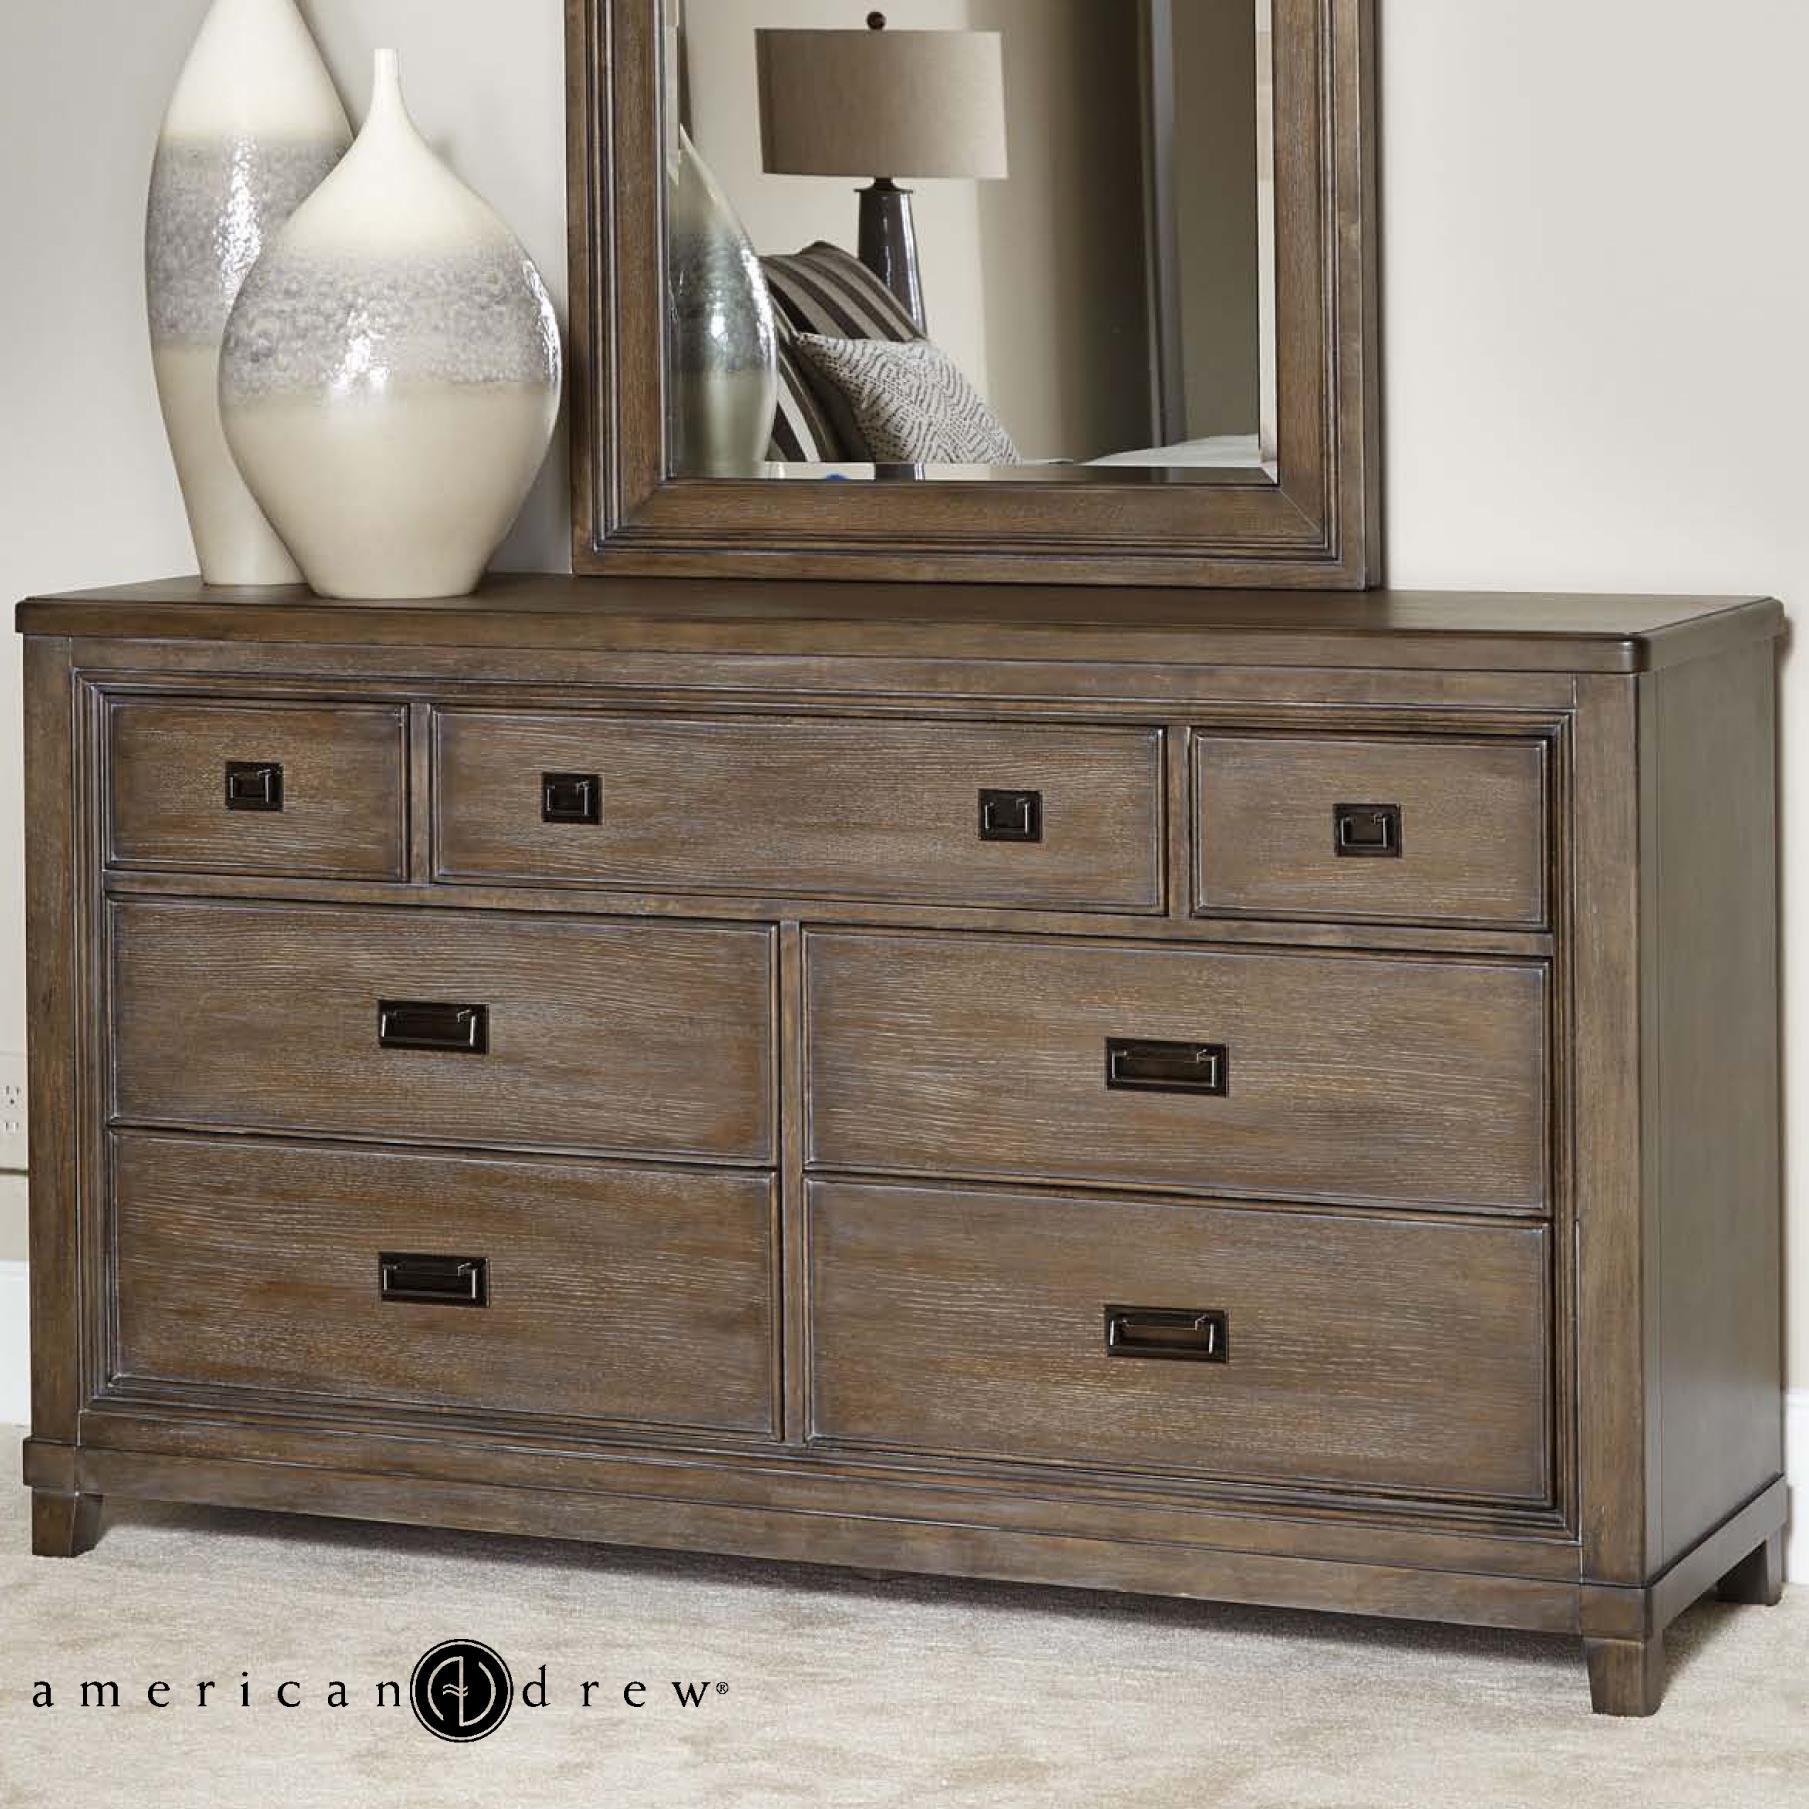 American Drew Park Studio Dresser - Item Number: 488-130